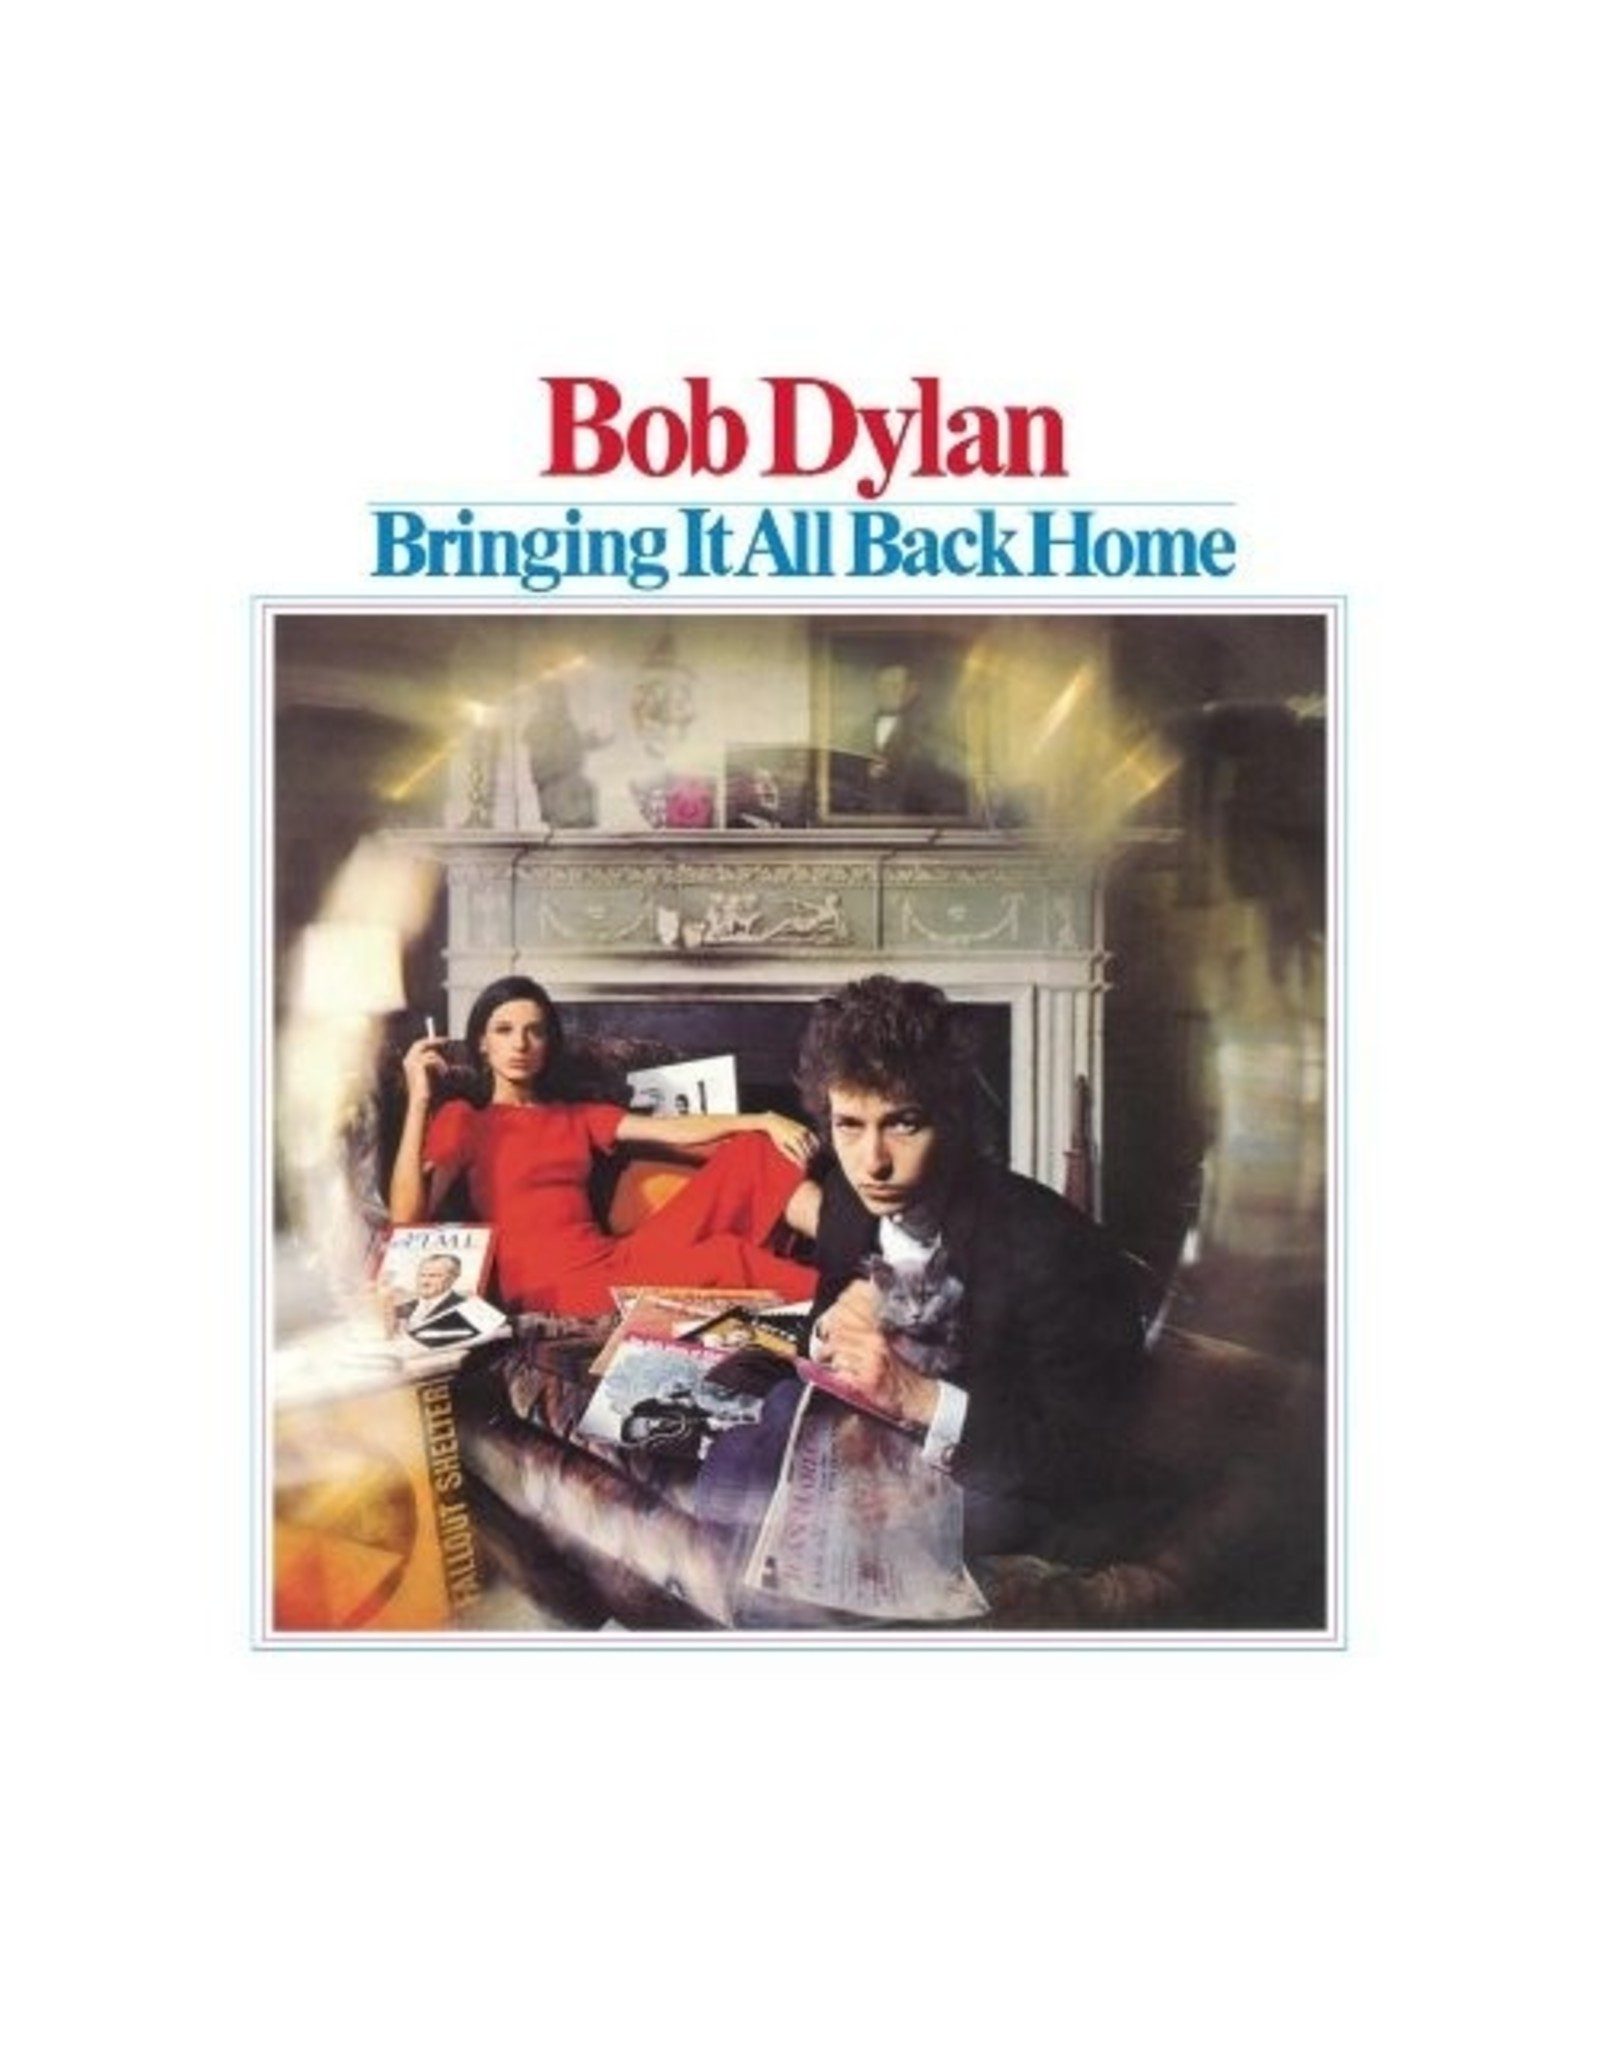 New Vinyl Bob Dylan - Bringing It All Back Home LP